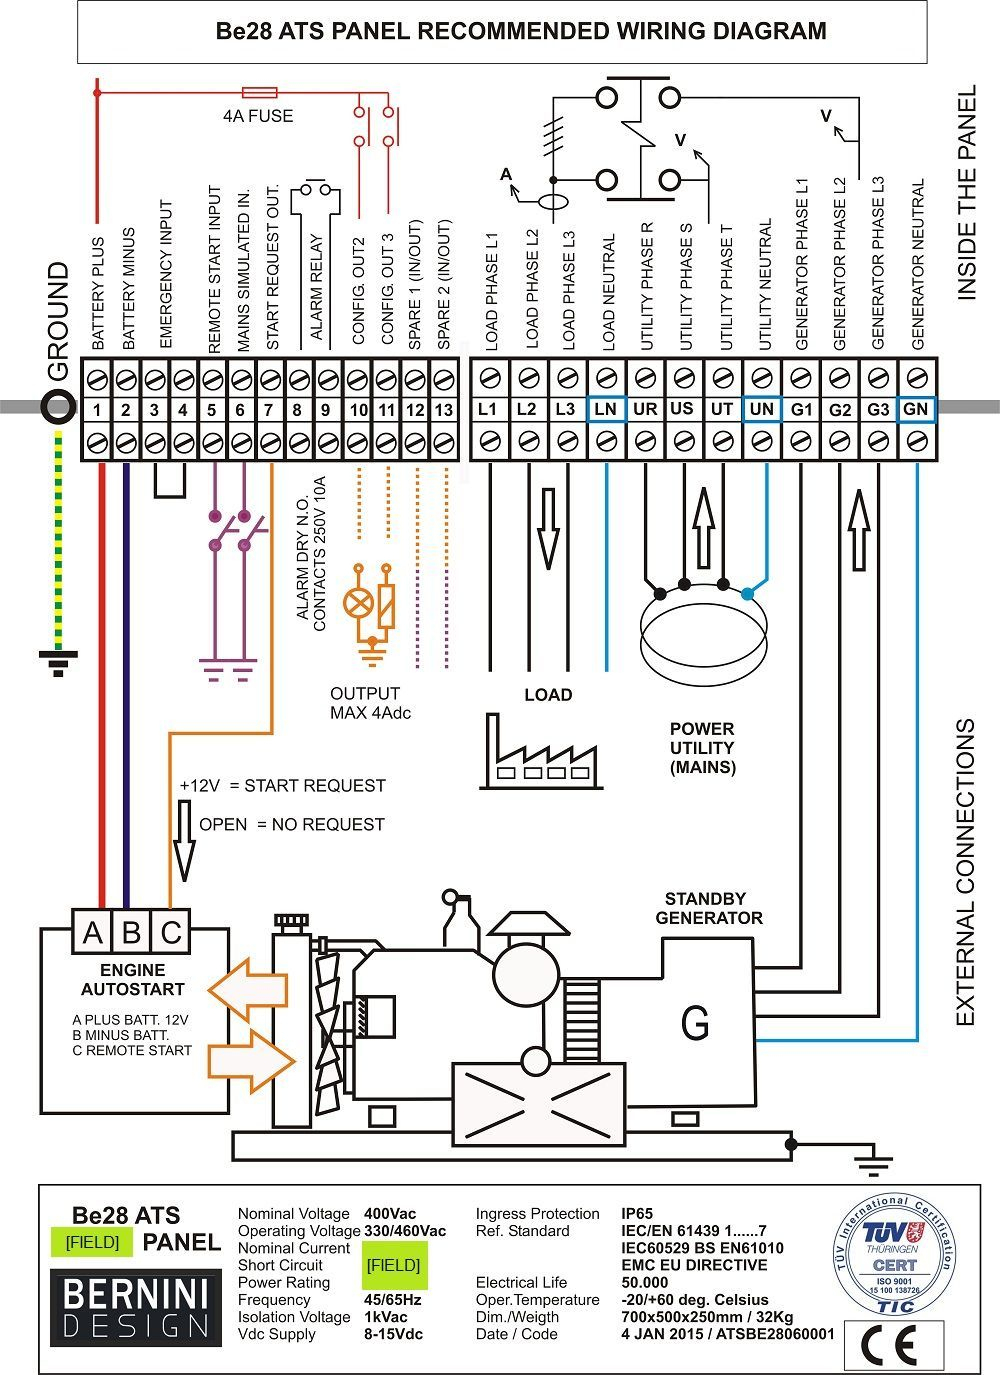 Generac Automatic Transfer Switch Wiring Diagram And Generator - Generac Transfer Switch Wiring Diagram